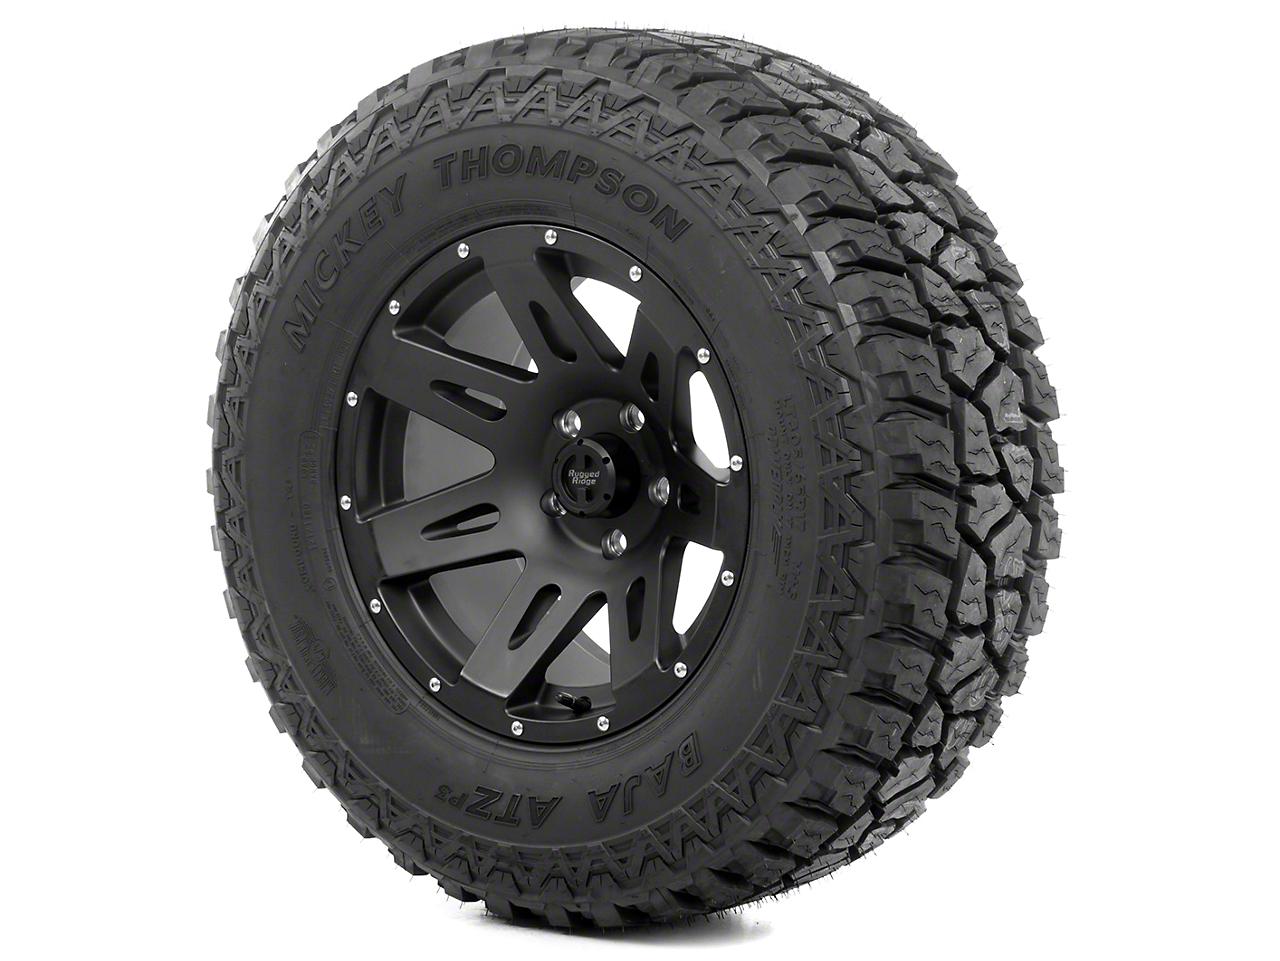 Rugged Ridge XHD Wheel 17x9 Black Satin and Mickey Thompson ATZ P3 305/65R17 Tire Kit (13-18 Wrangler JK)